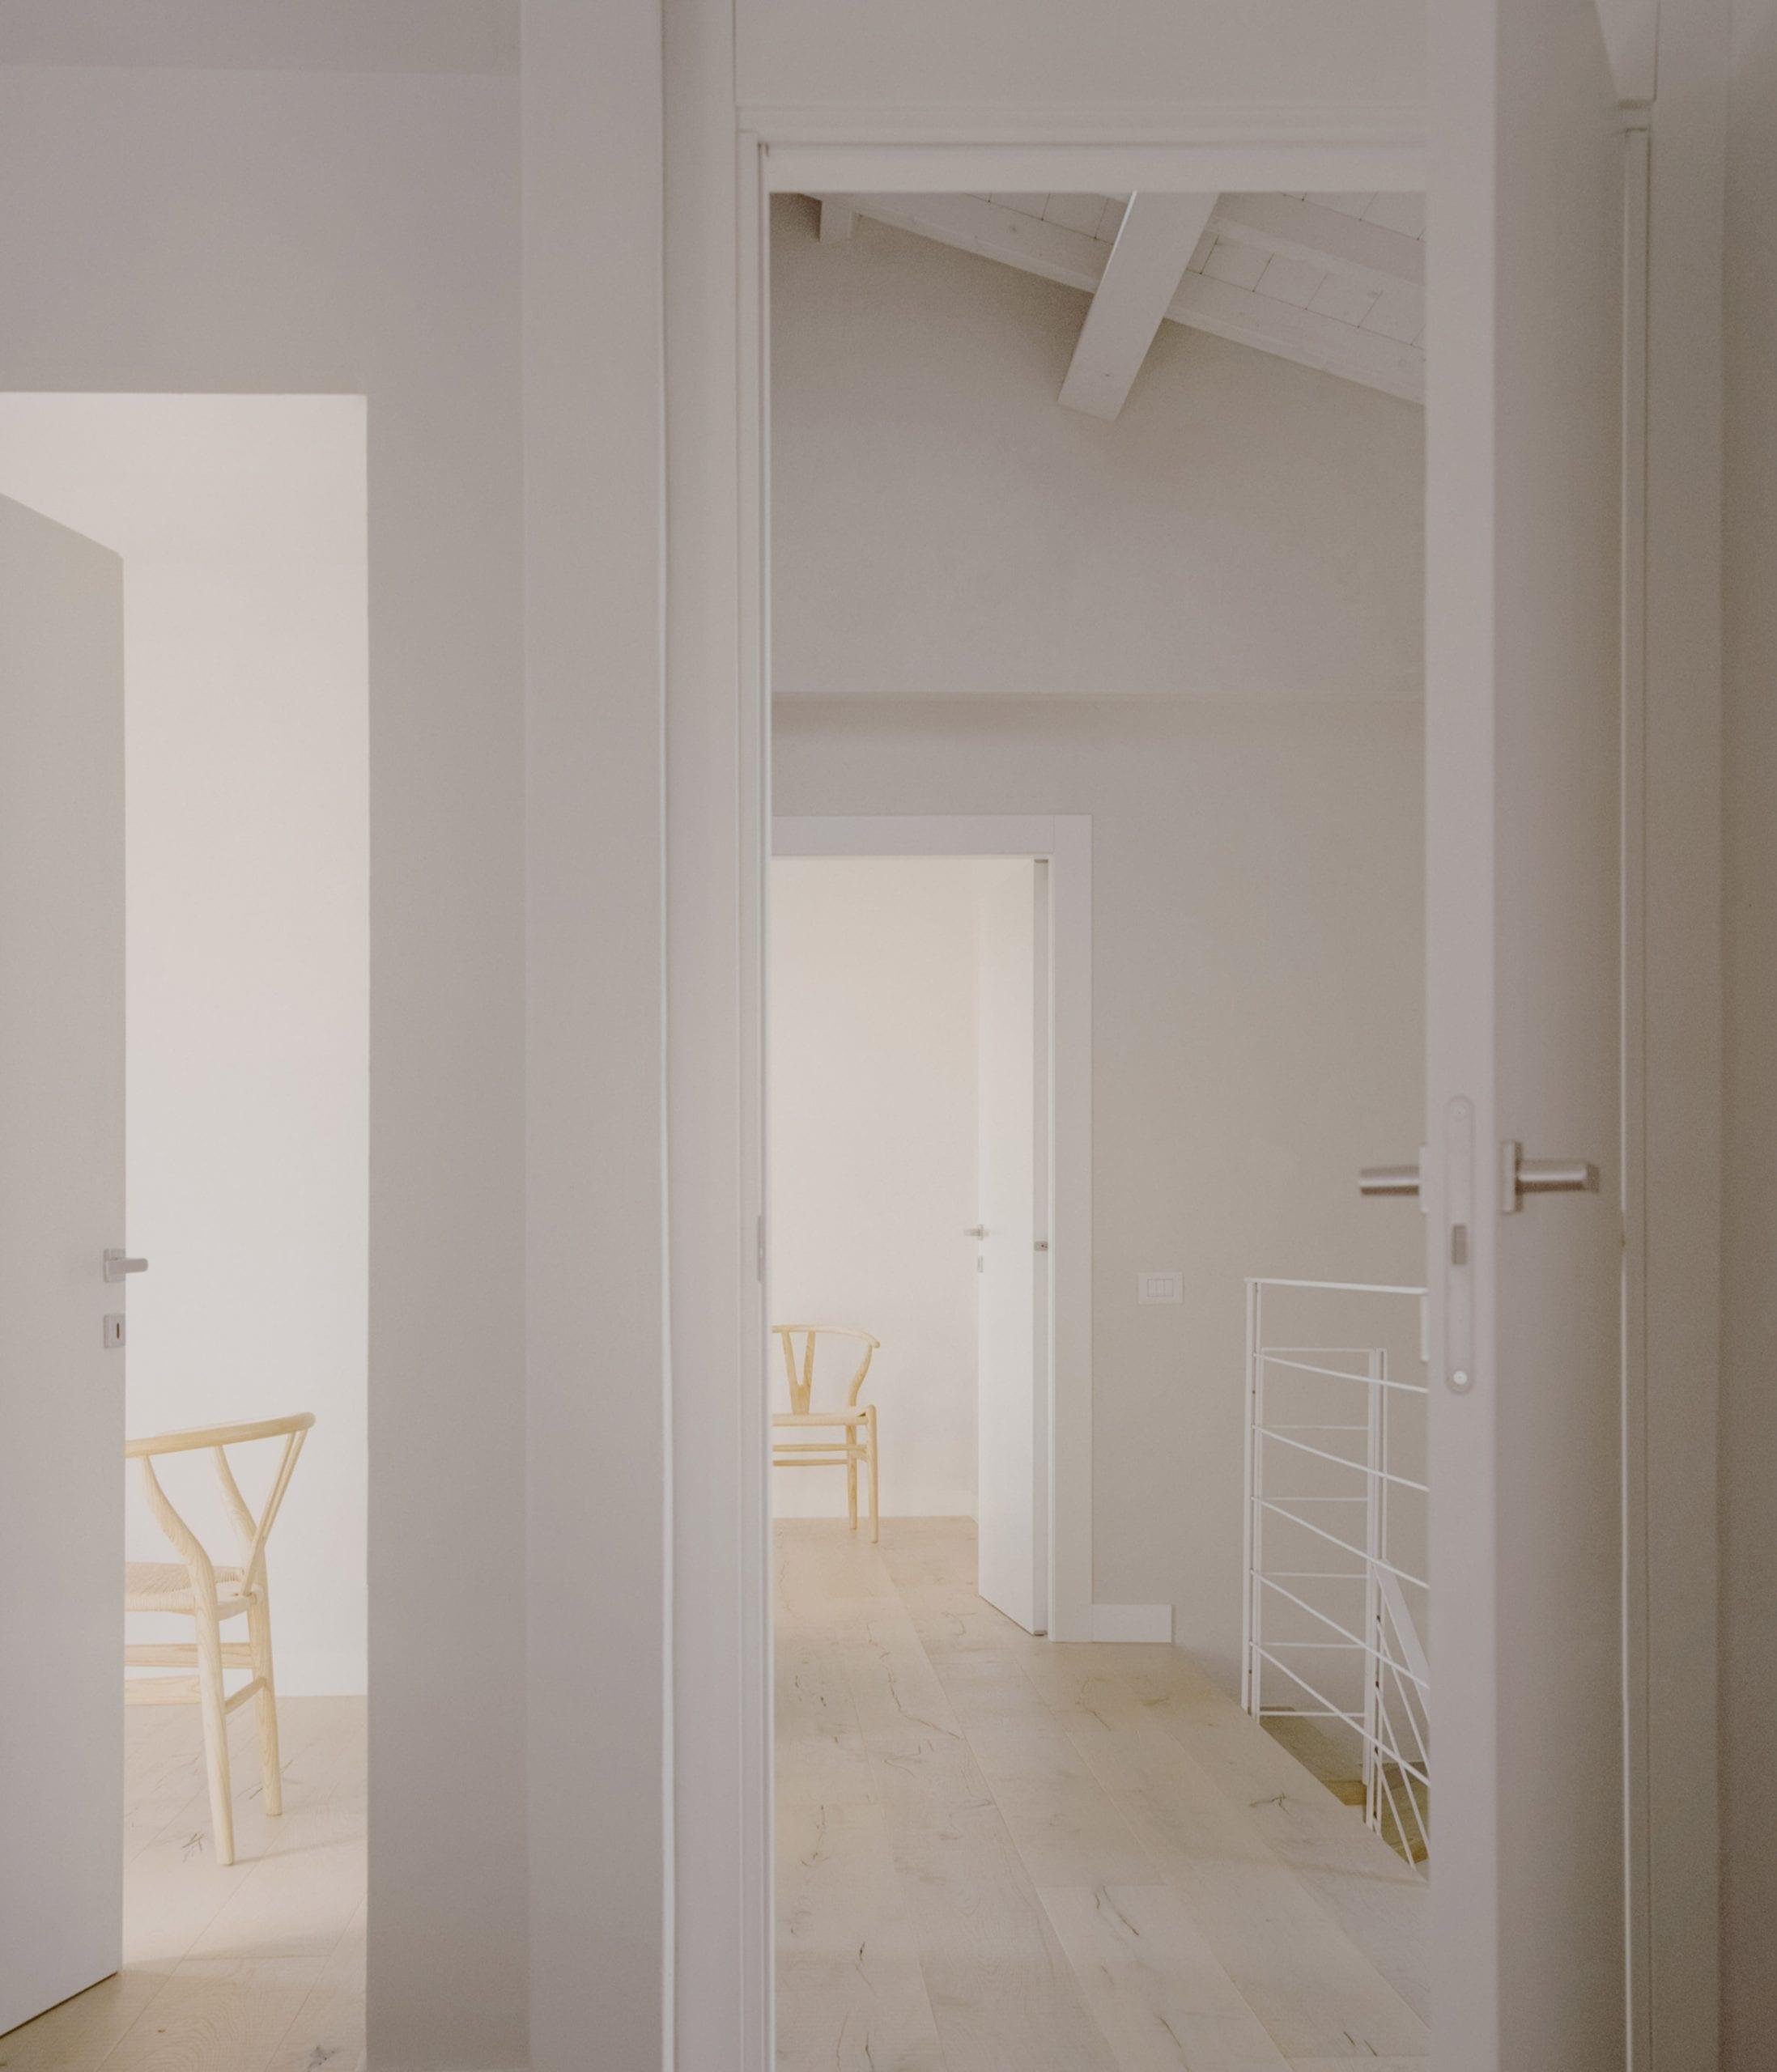 Light wood covers the floors of the Casamanda residence